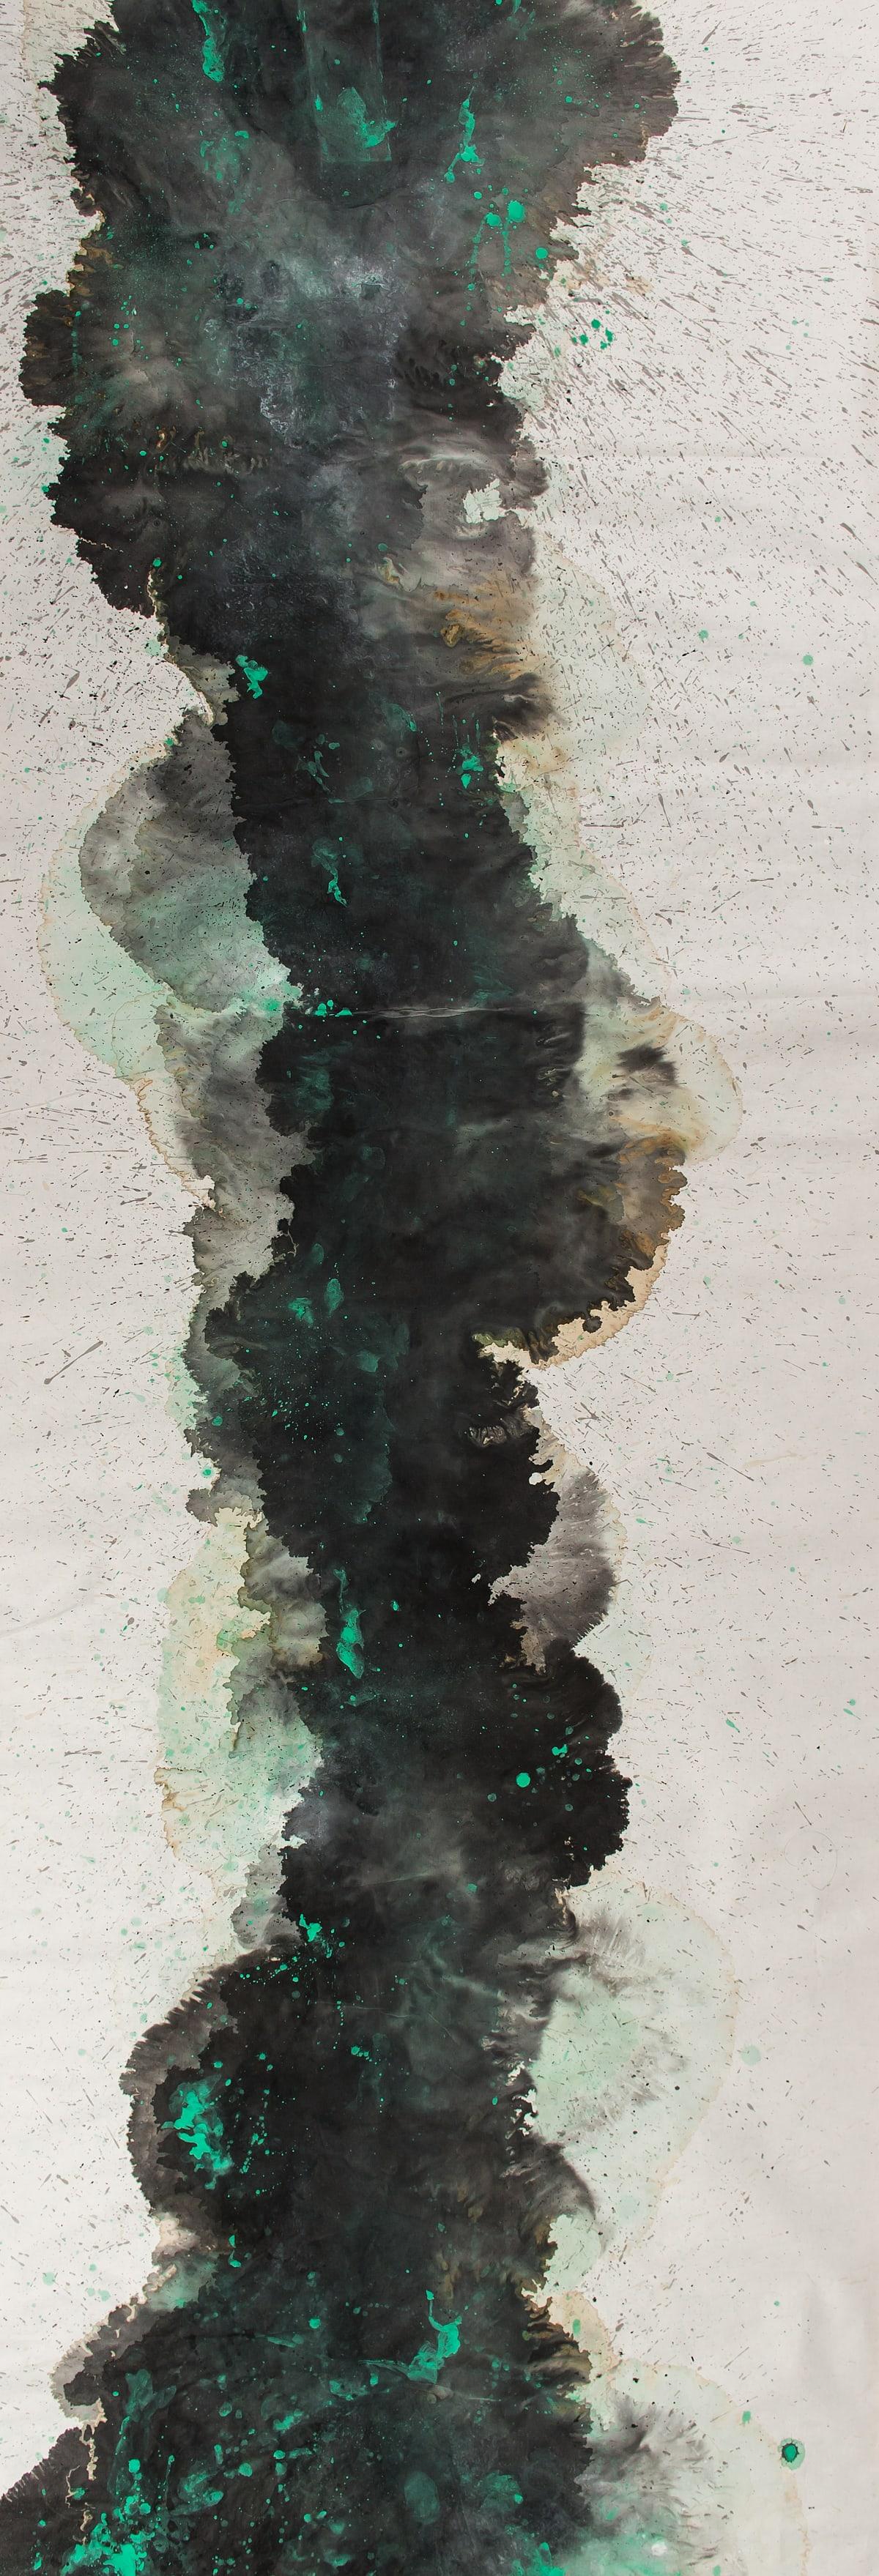 Chloe Ho 何鳳蓮, Parallel Universe 3, 2017